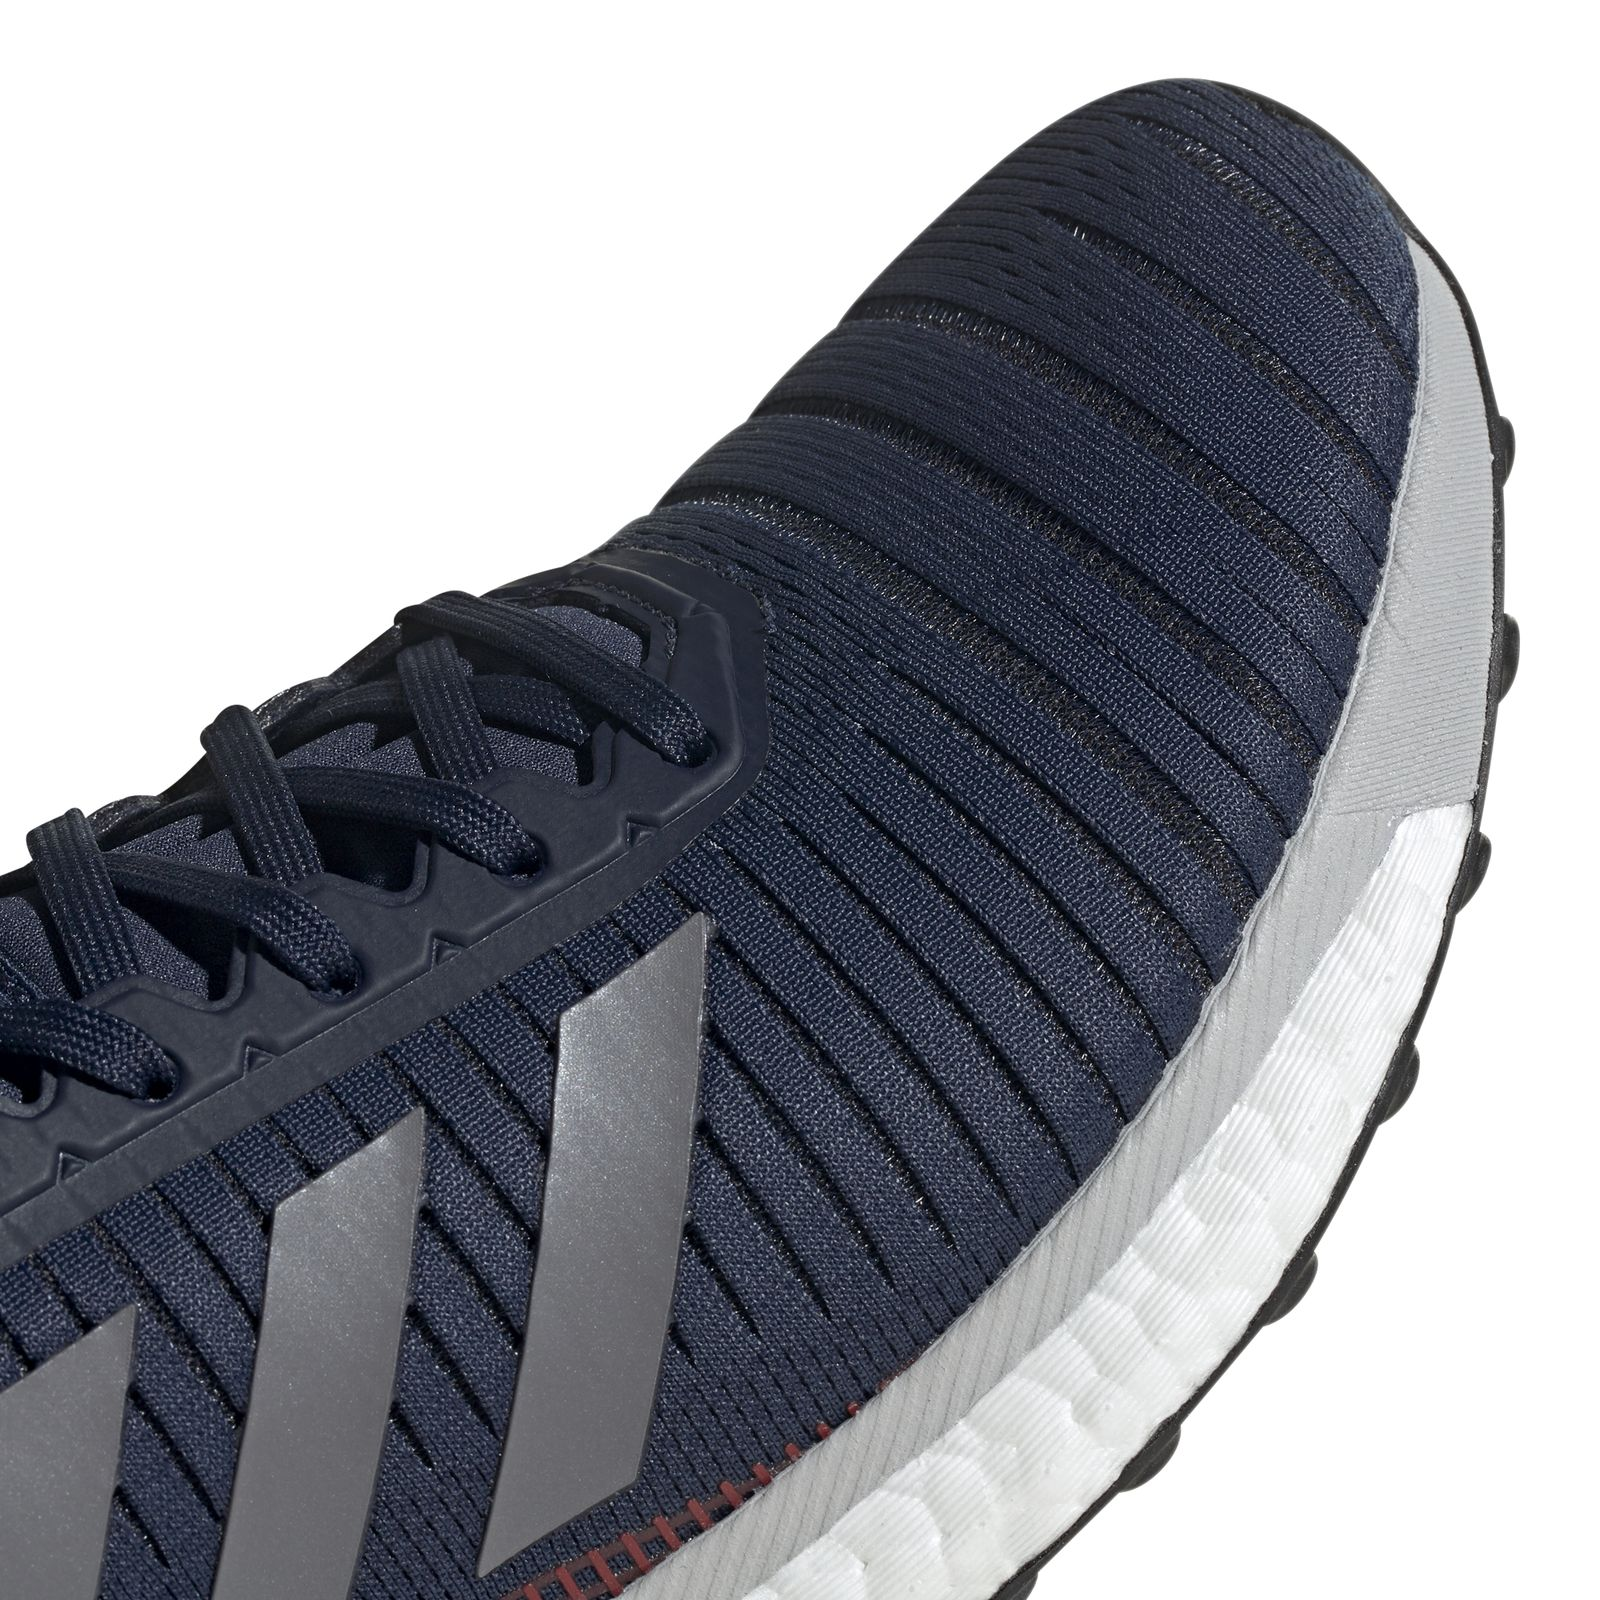 Detalles de Adidas performance señores running mentecato solar Glide 19 m Boost azul rojo ver título original